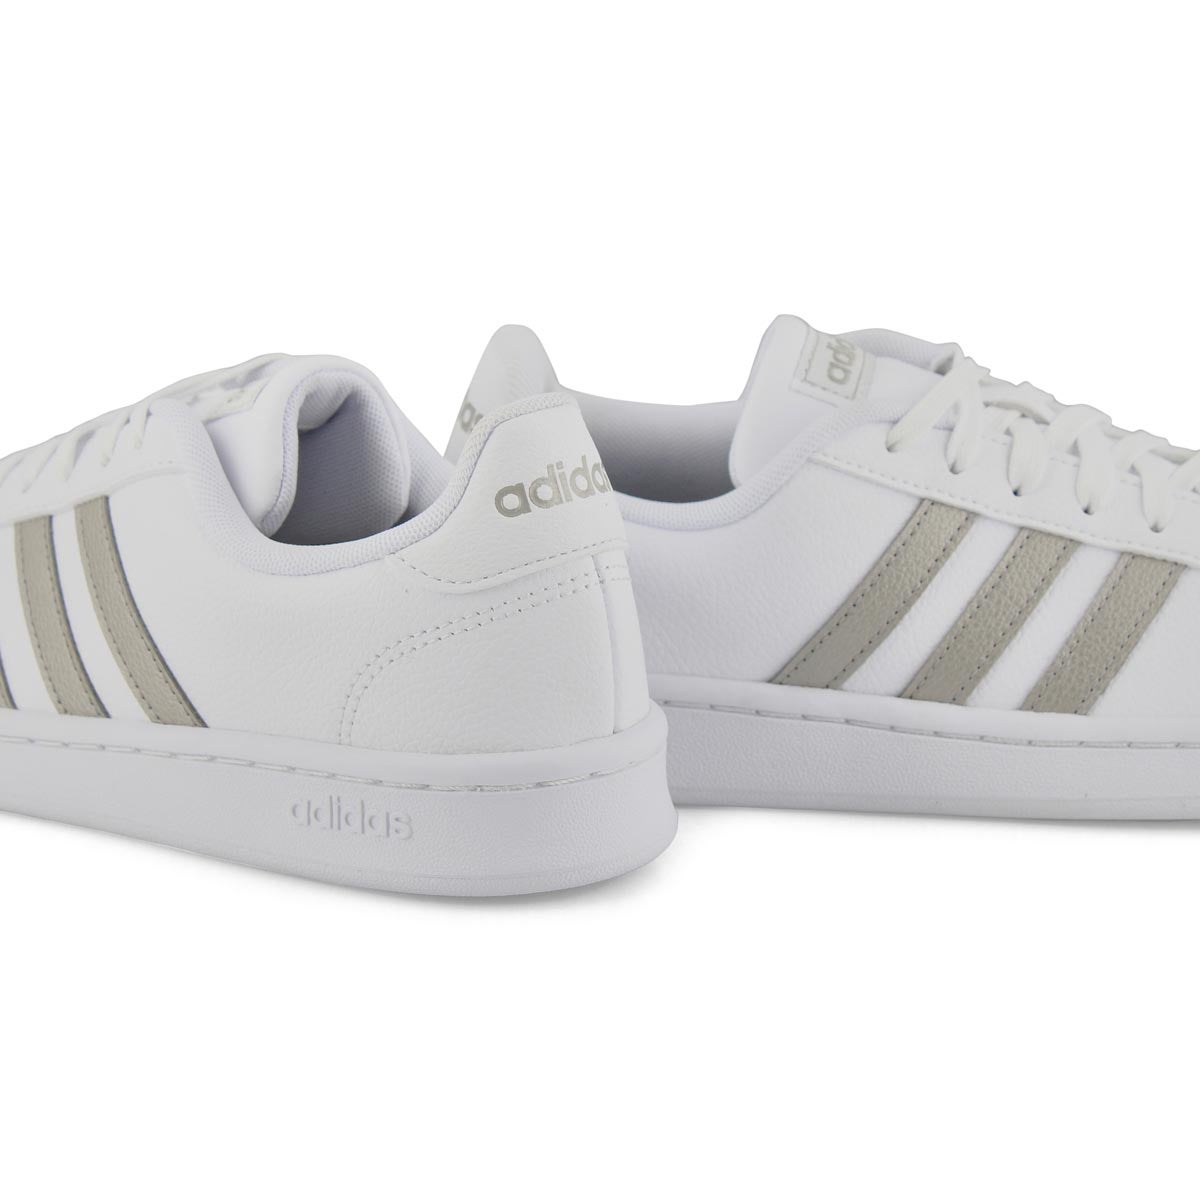 Women's Grand Court Sneaker - White/Platinum